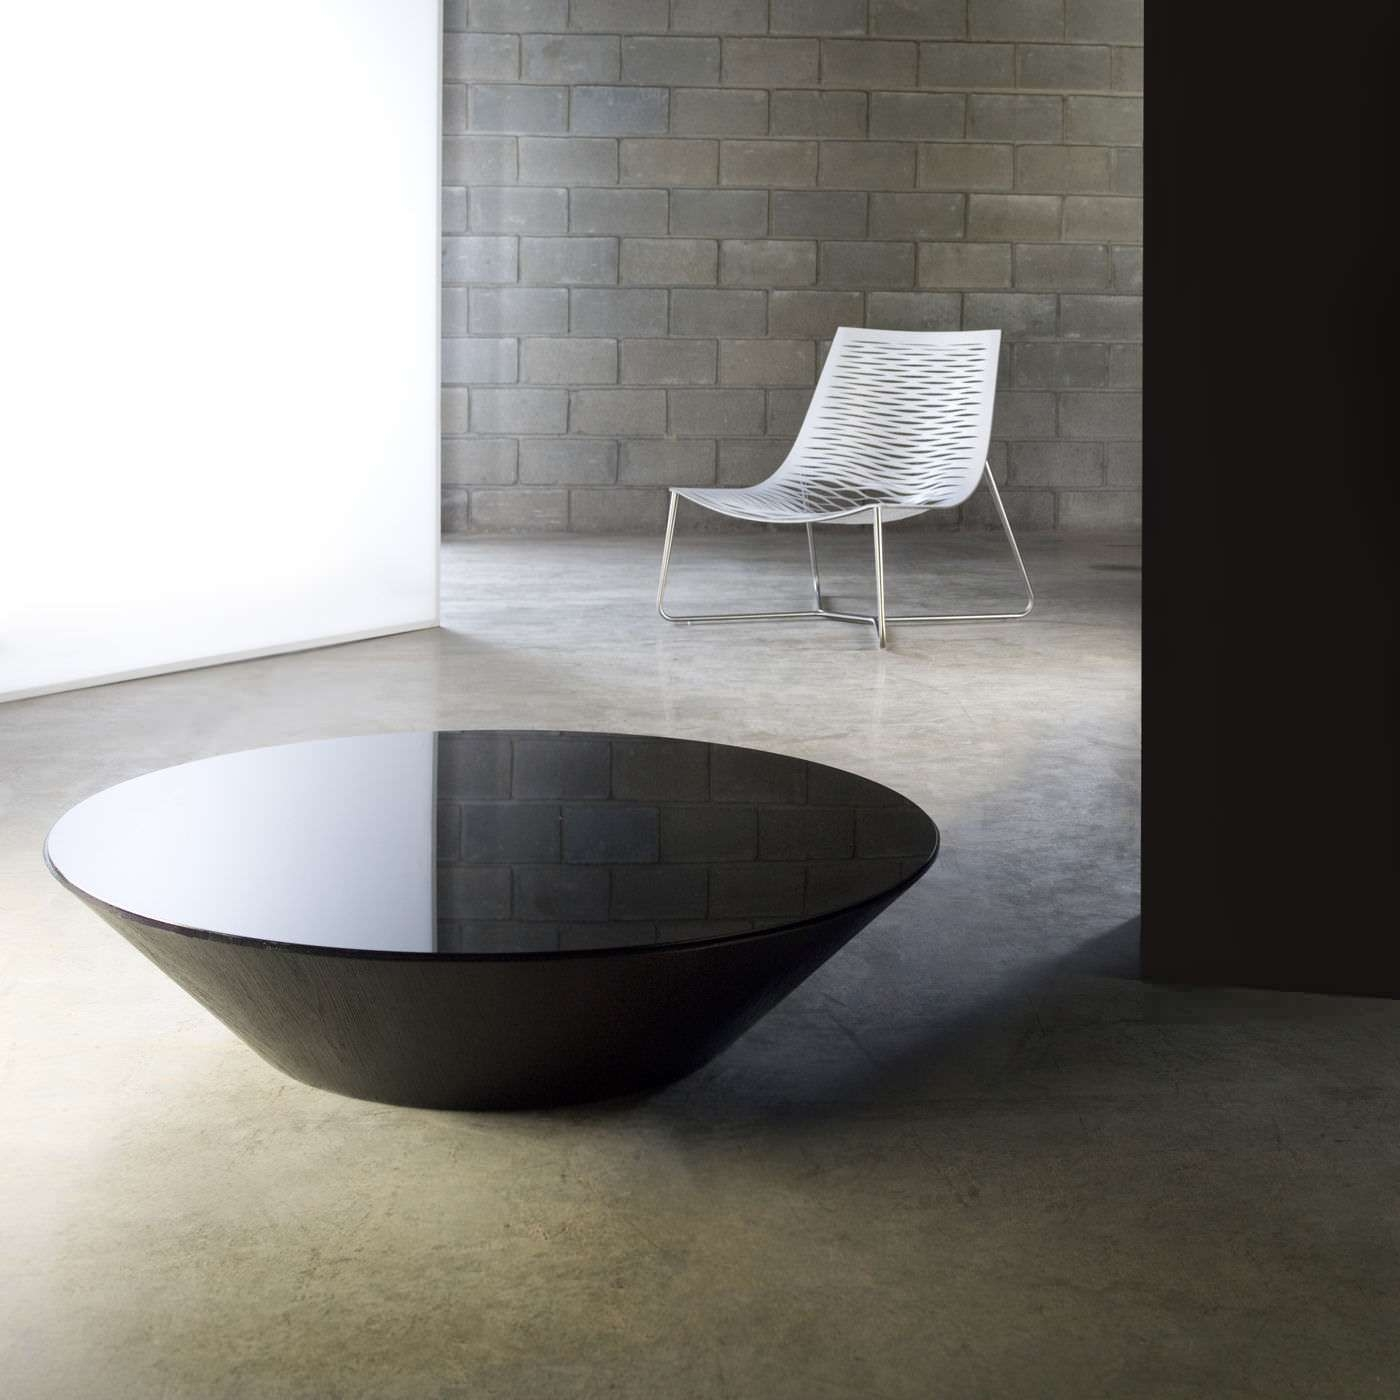 Popular Contemporary Coffee Table Regarding Contemporary Coffee Table / Glass / Round – Dorset – Modloft (View 18 of 20)